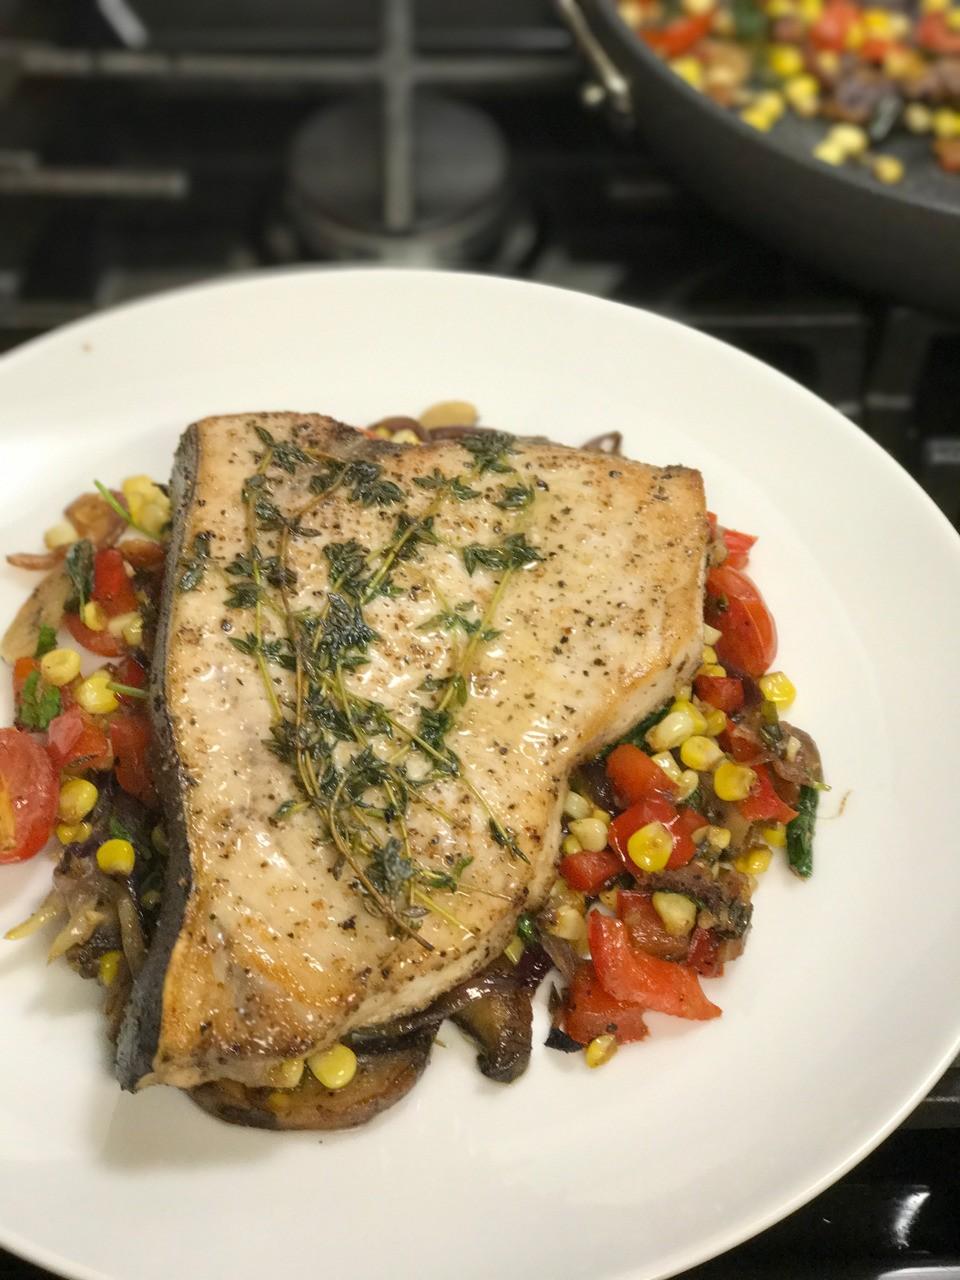 From my Kitchen. Sauté Swordfish Steak with Fresh Corn, Mushroom and Tomato Medley. Urbanskitchen.com